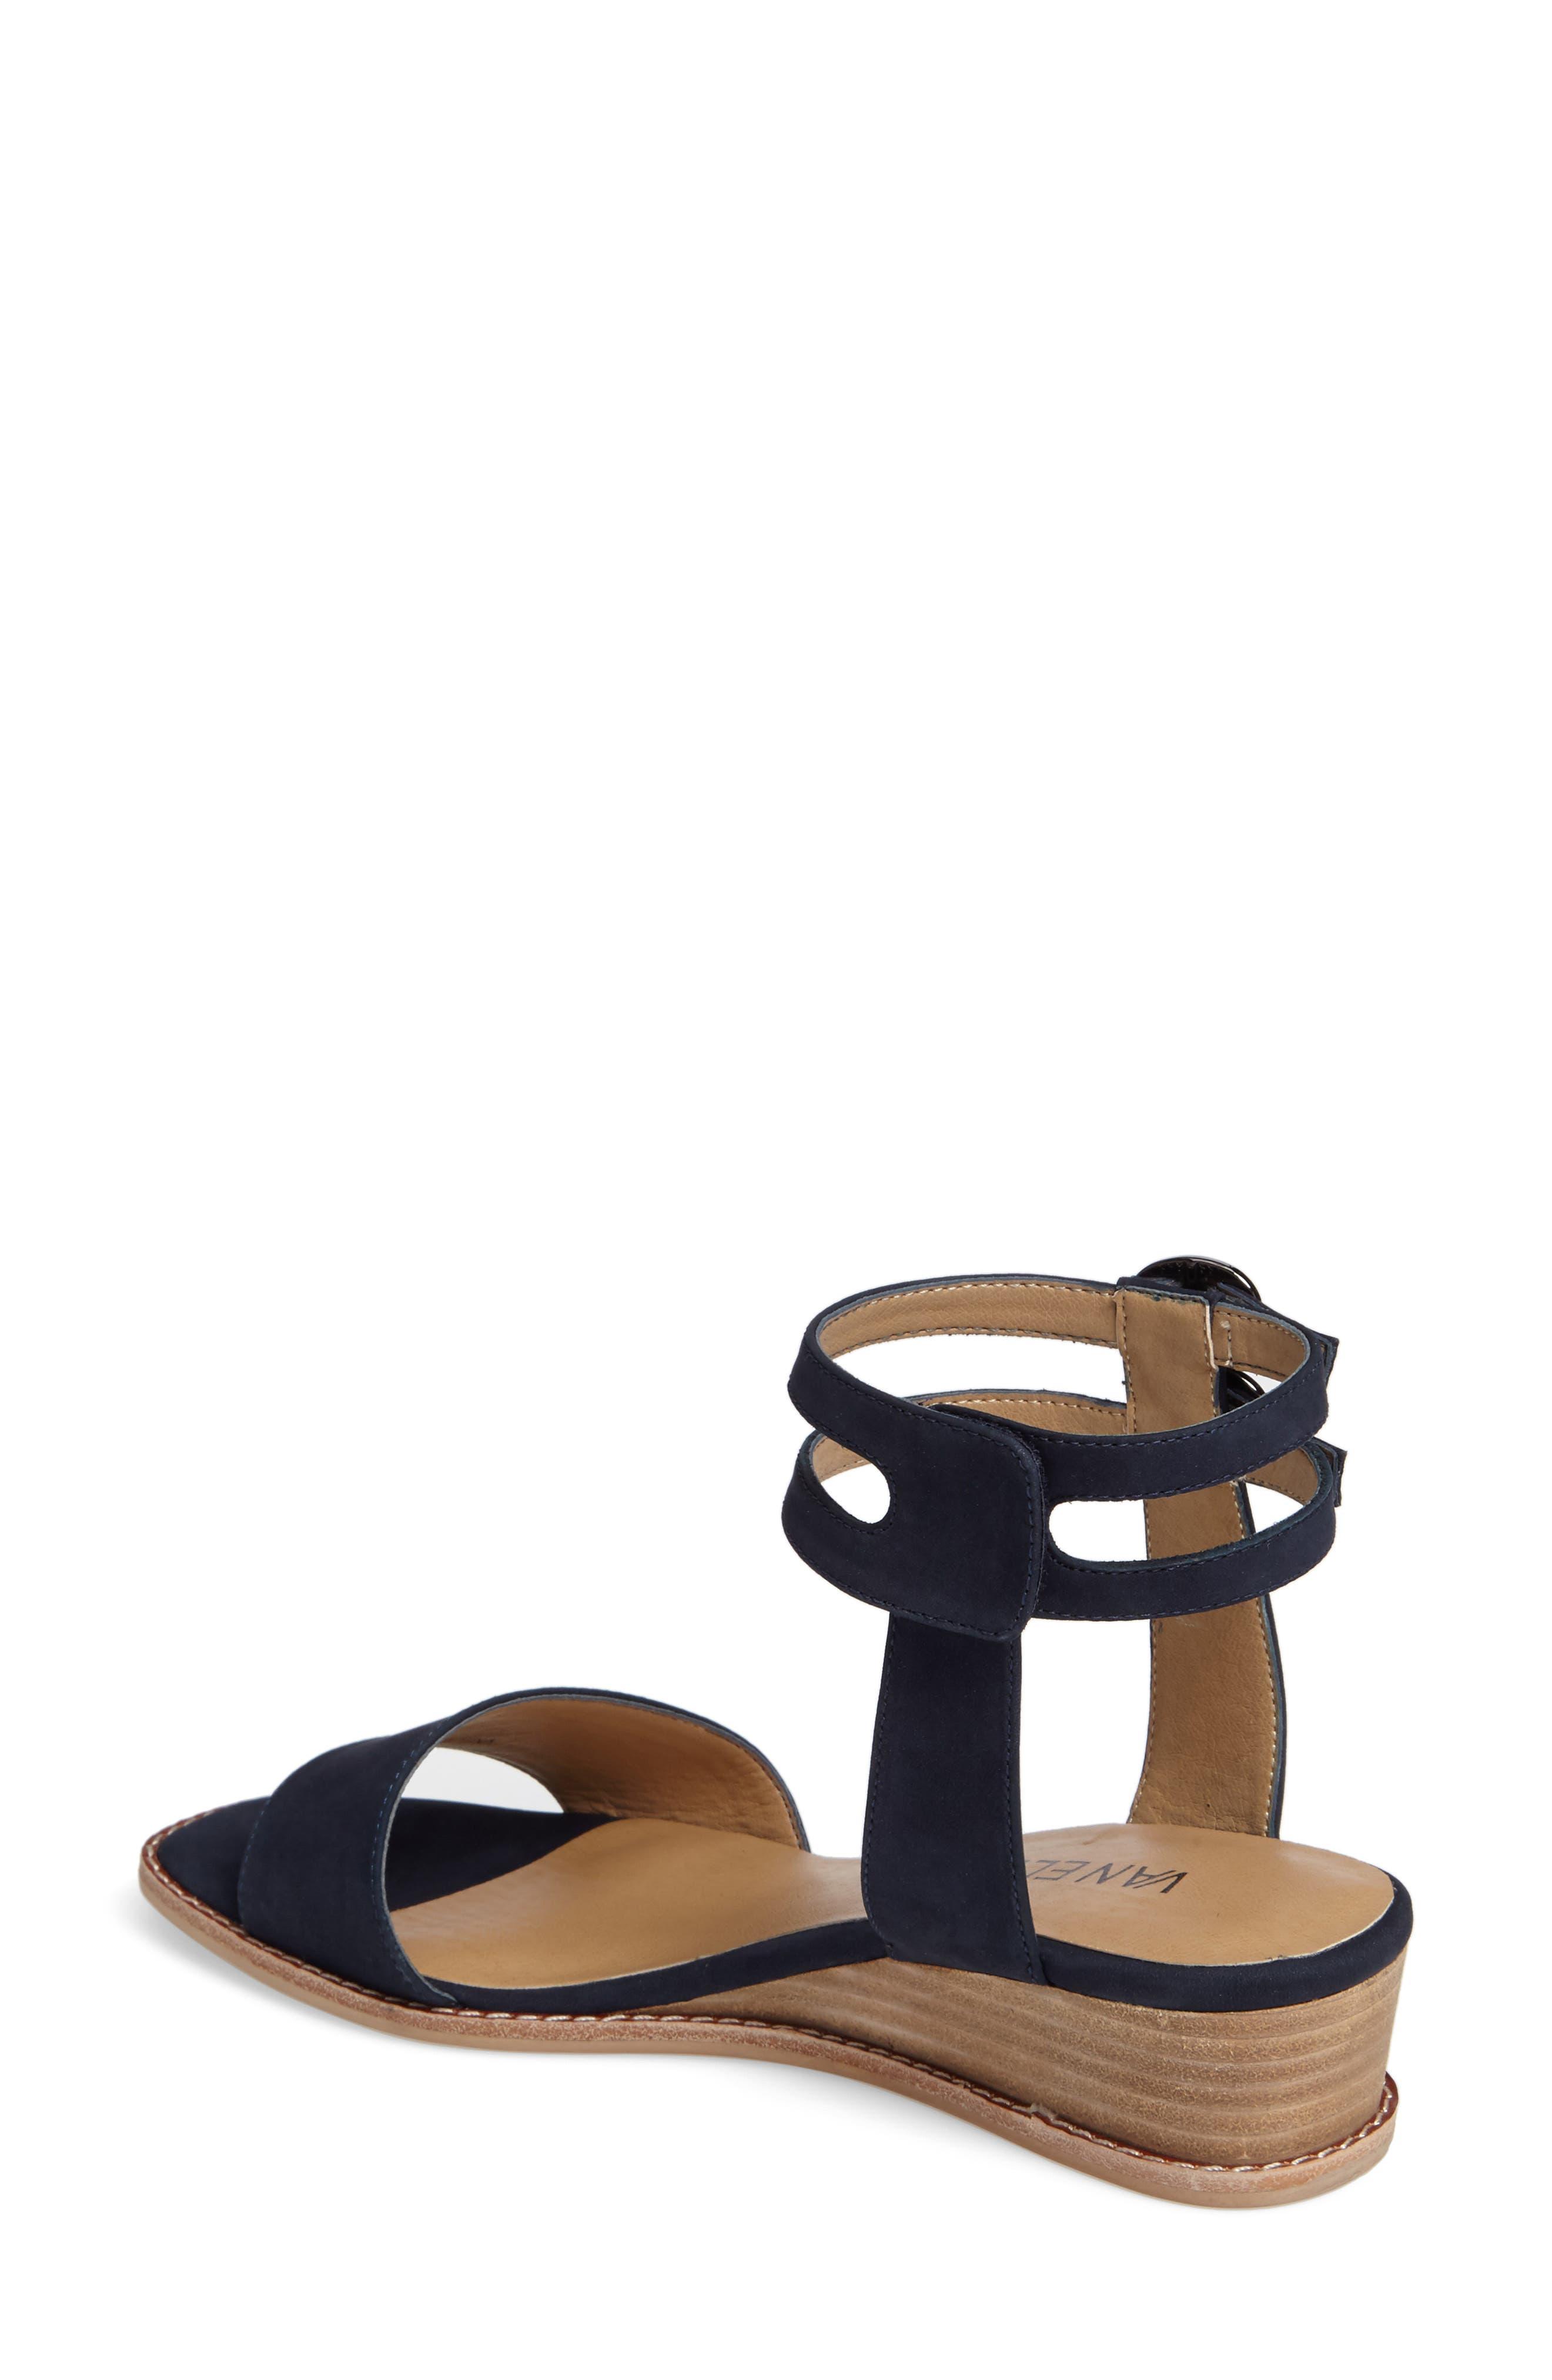 Jarita Ankle Strap Sandal,                             Alternate thumbnail 2, color,                             Navy Leather